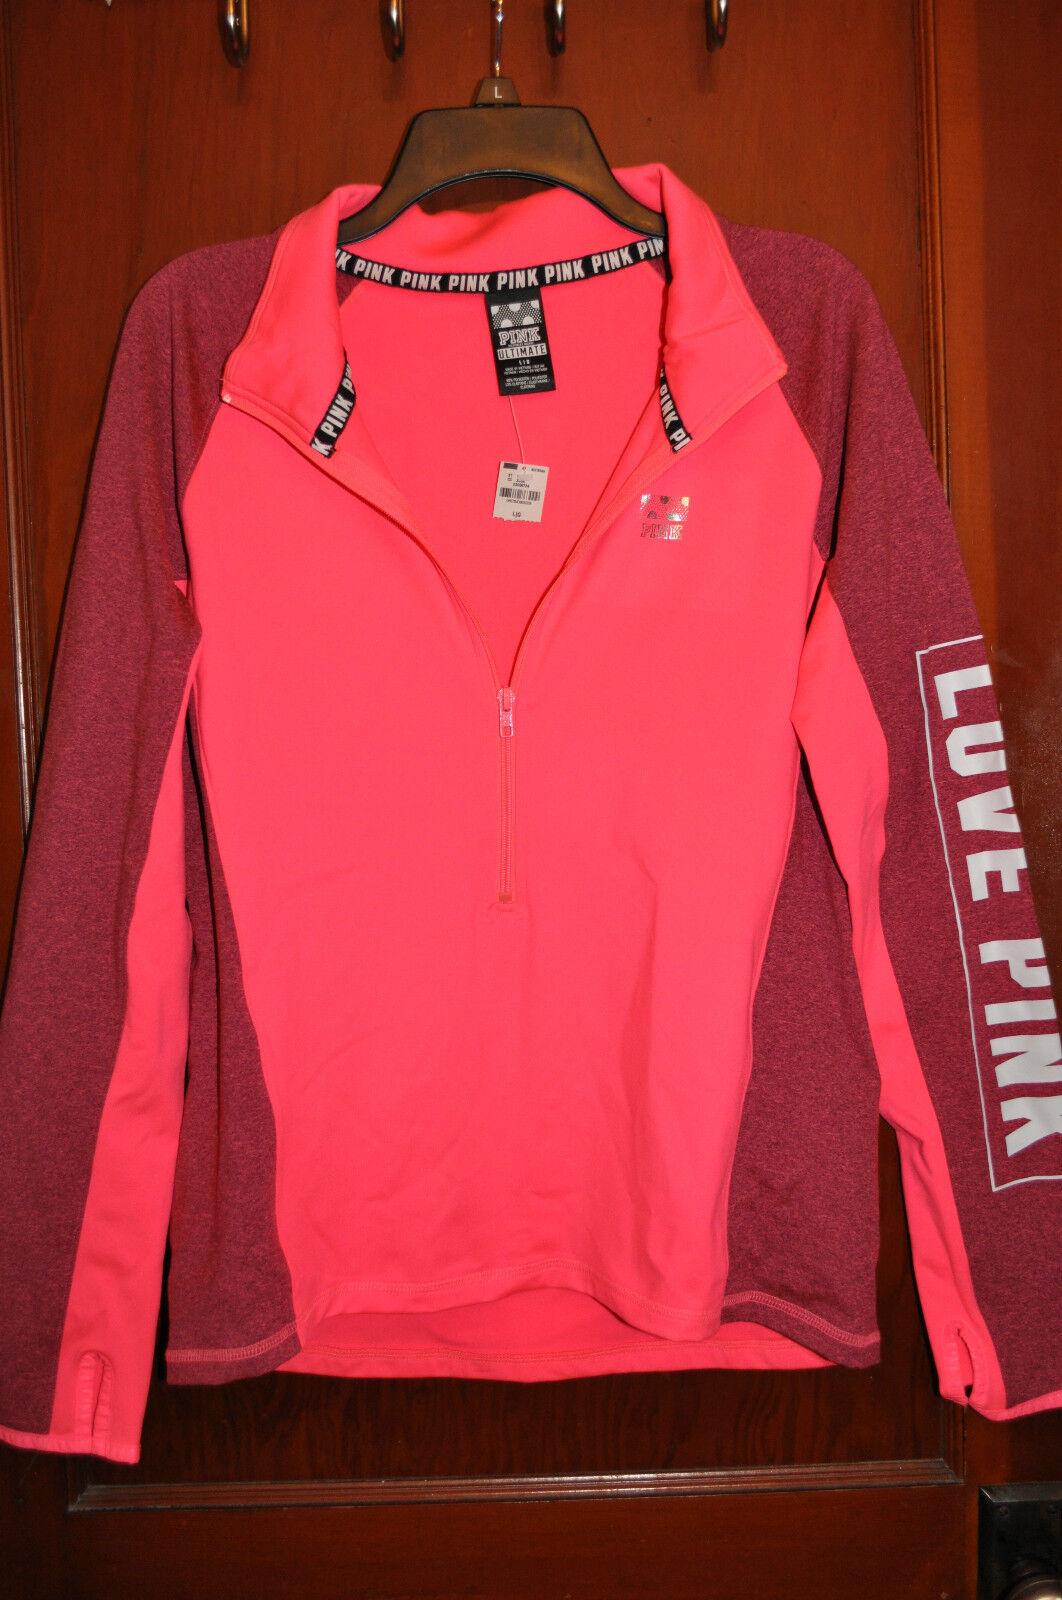 Victoria's Secret Pink Ultimate Deep Zip Pullover Large | eBay